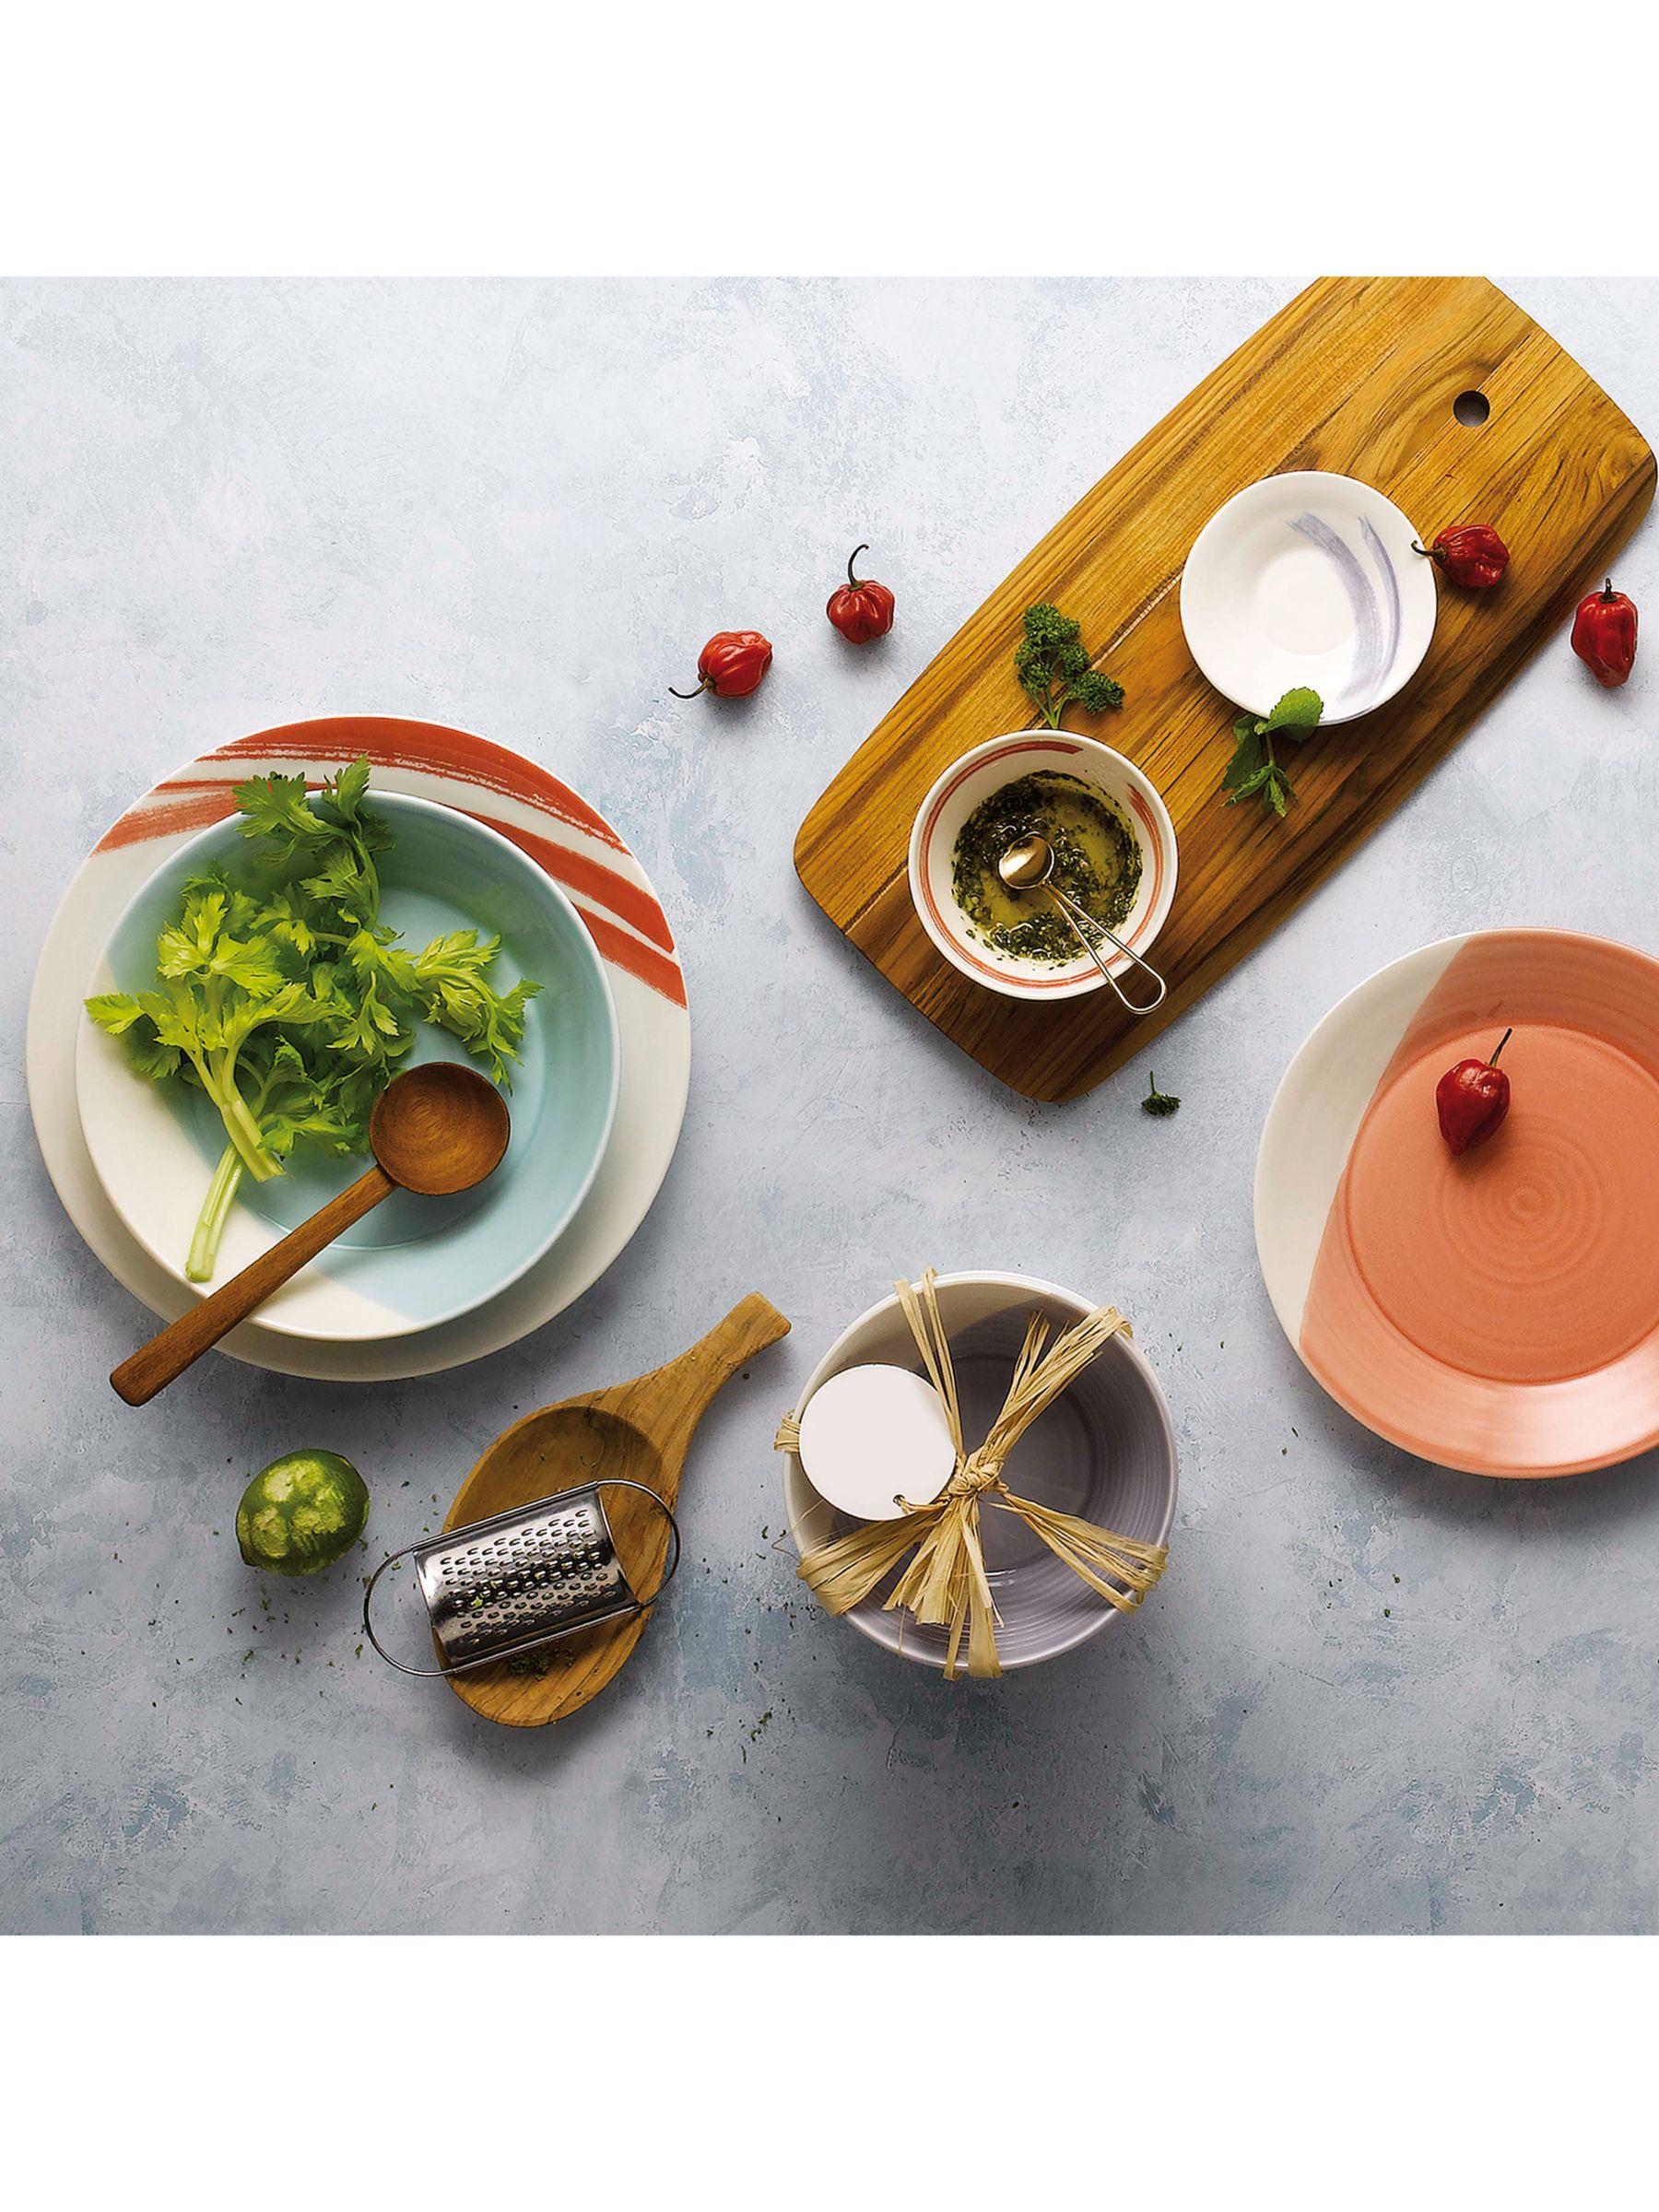 Royal Doulton Royal Doulton 1815 Bold Dinner Plates, Set of 6, 28.7cm, Assorted